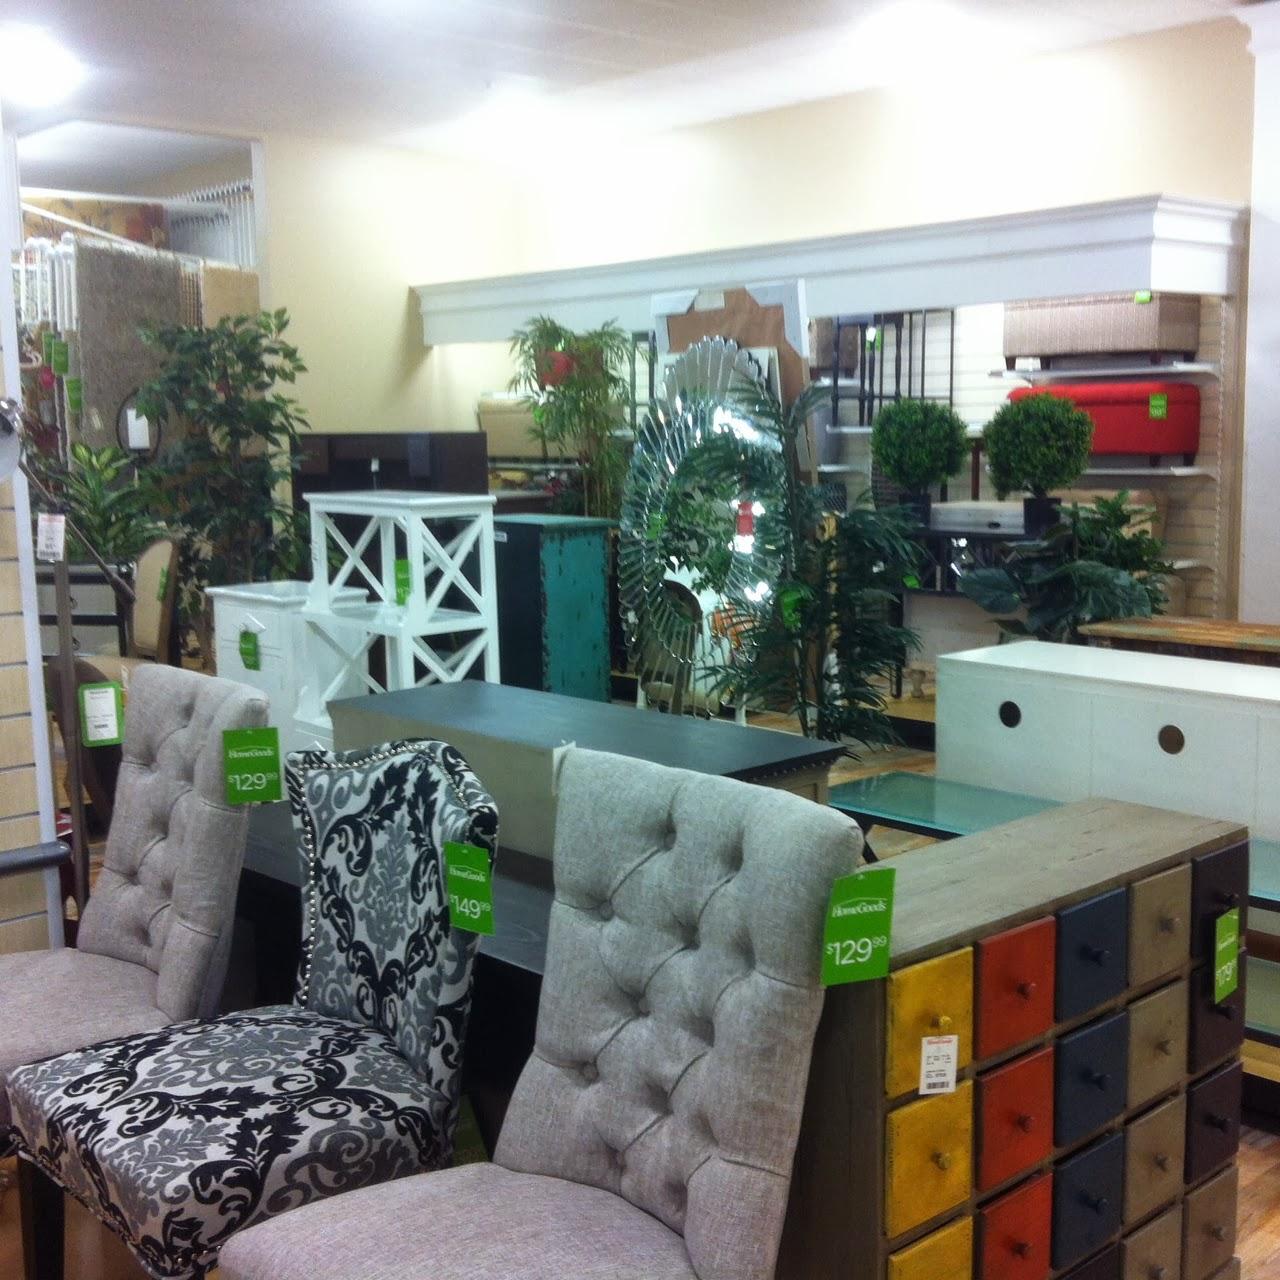 Homes Goods Furniture